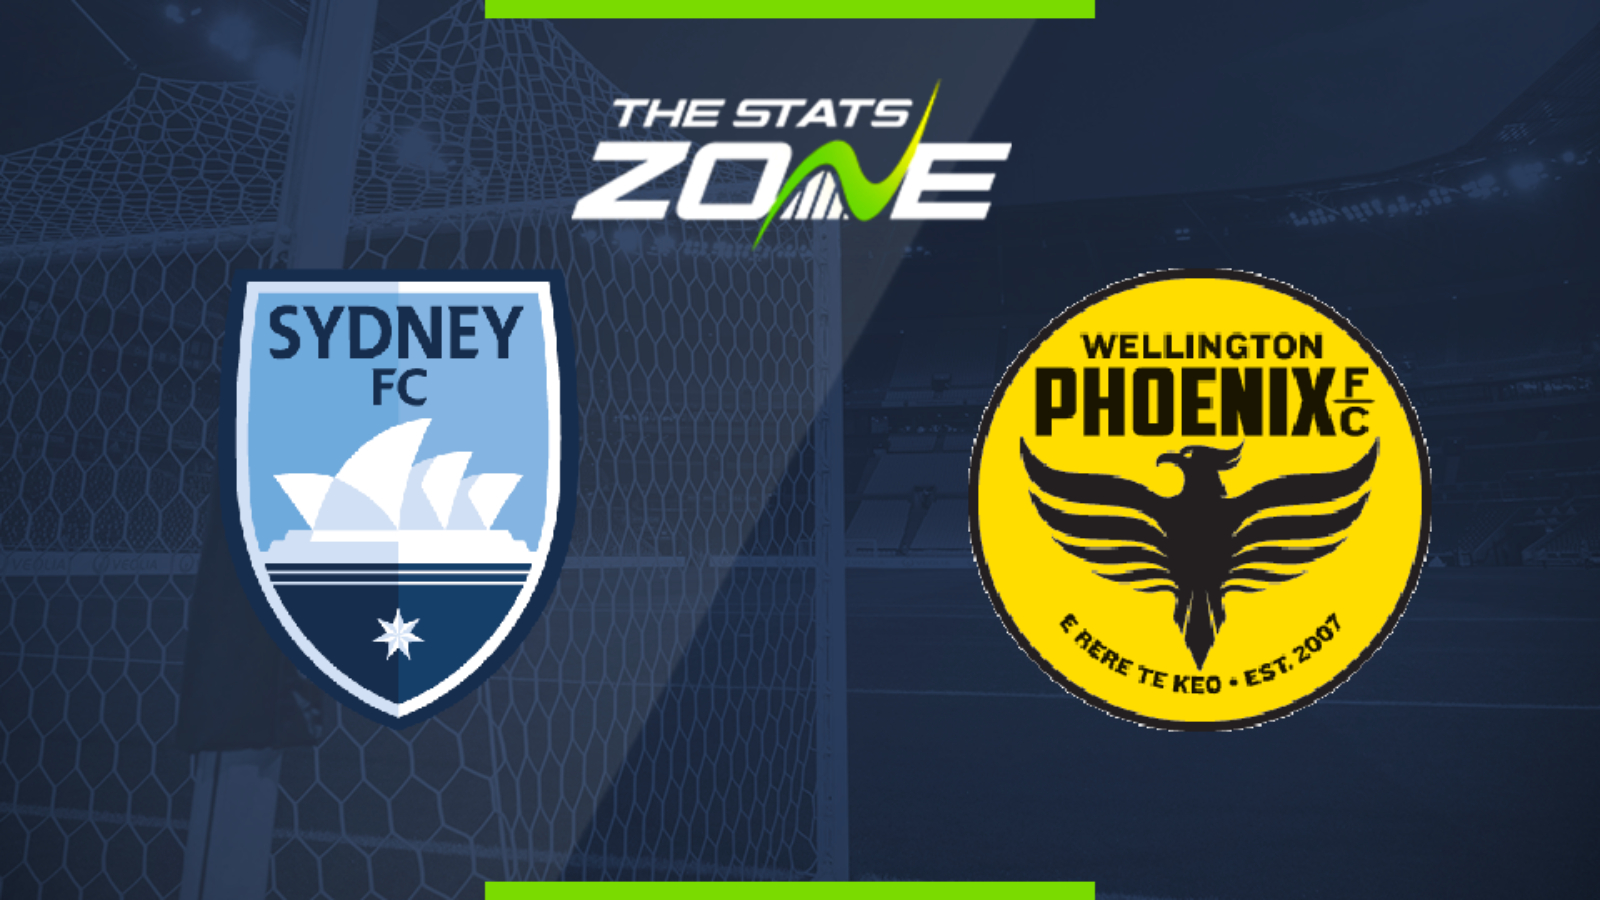 Sydney fc v wellington phoenix betting tips goal betting advice soccer